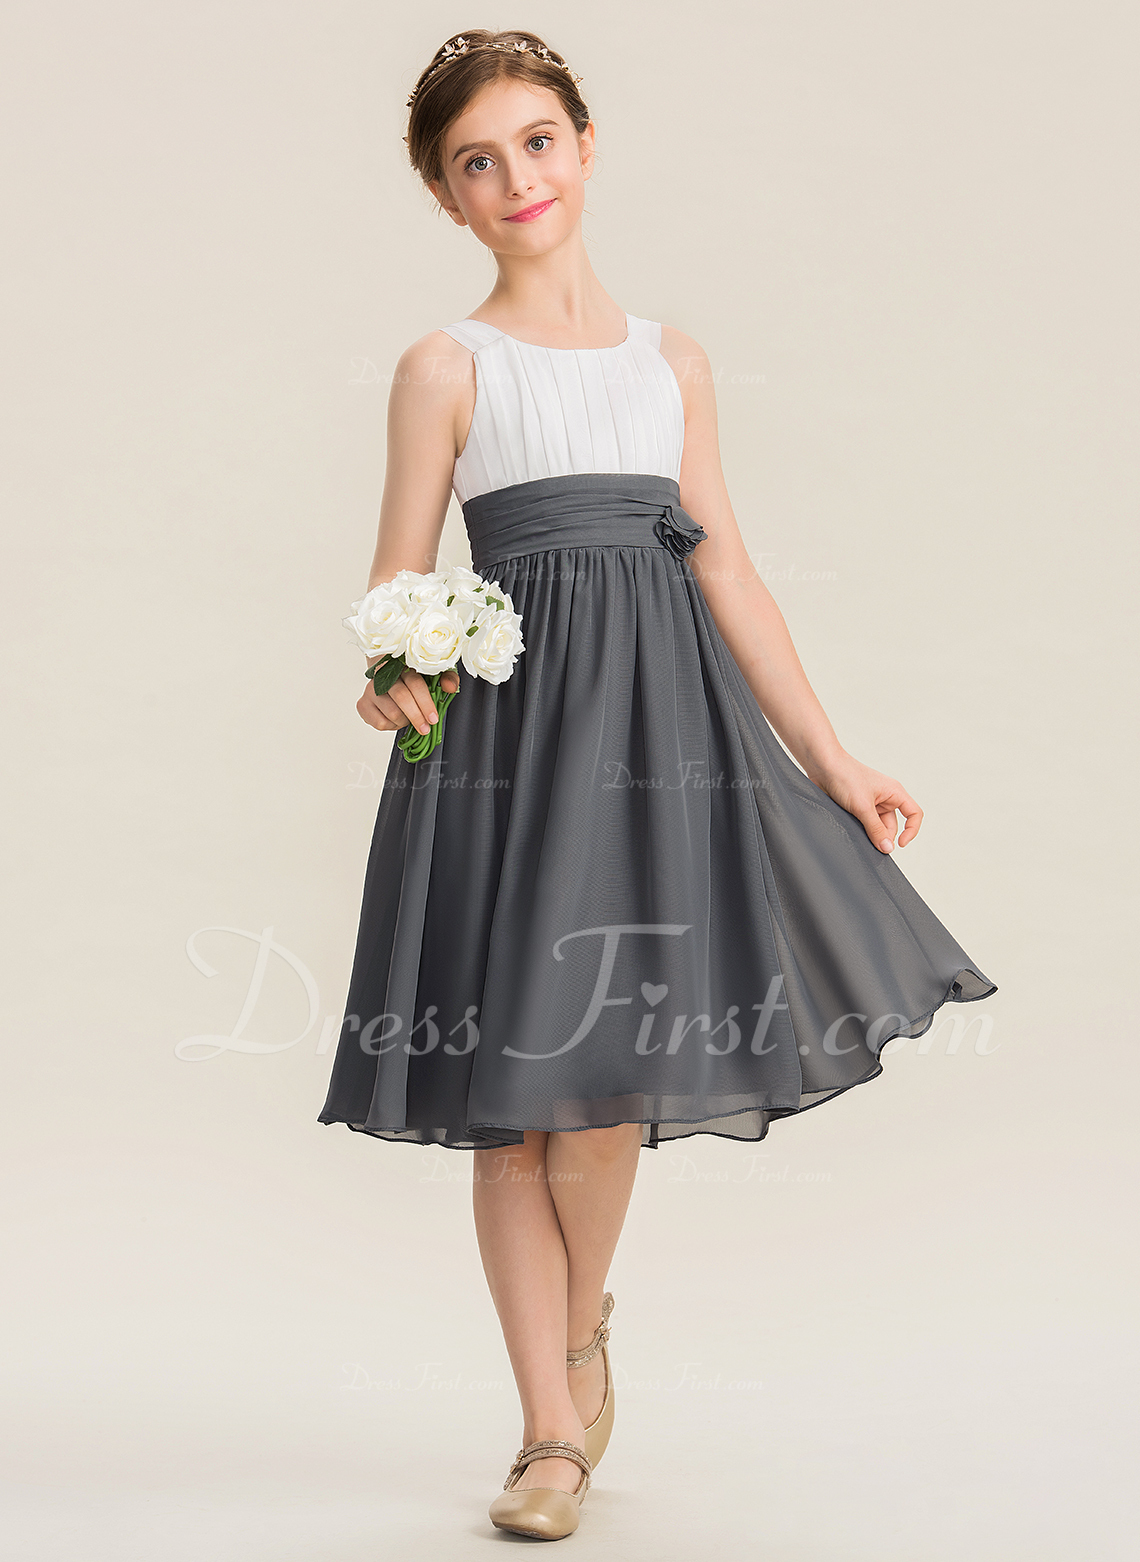 113aca2c1083b A-Line Scoop Neck Knee-Length Chiffon Junior Bridesmaid Dress With ...